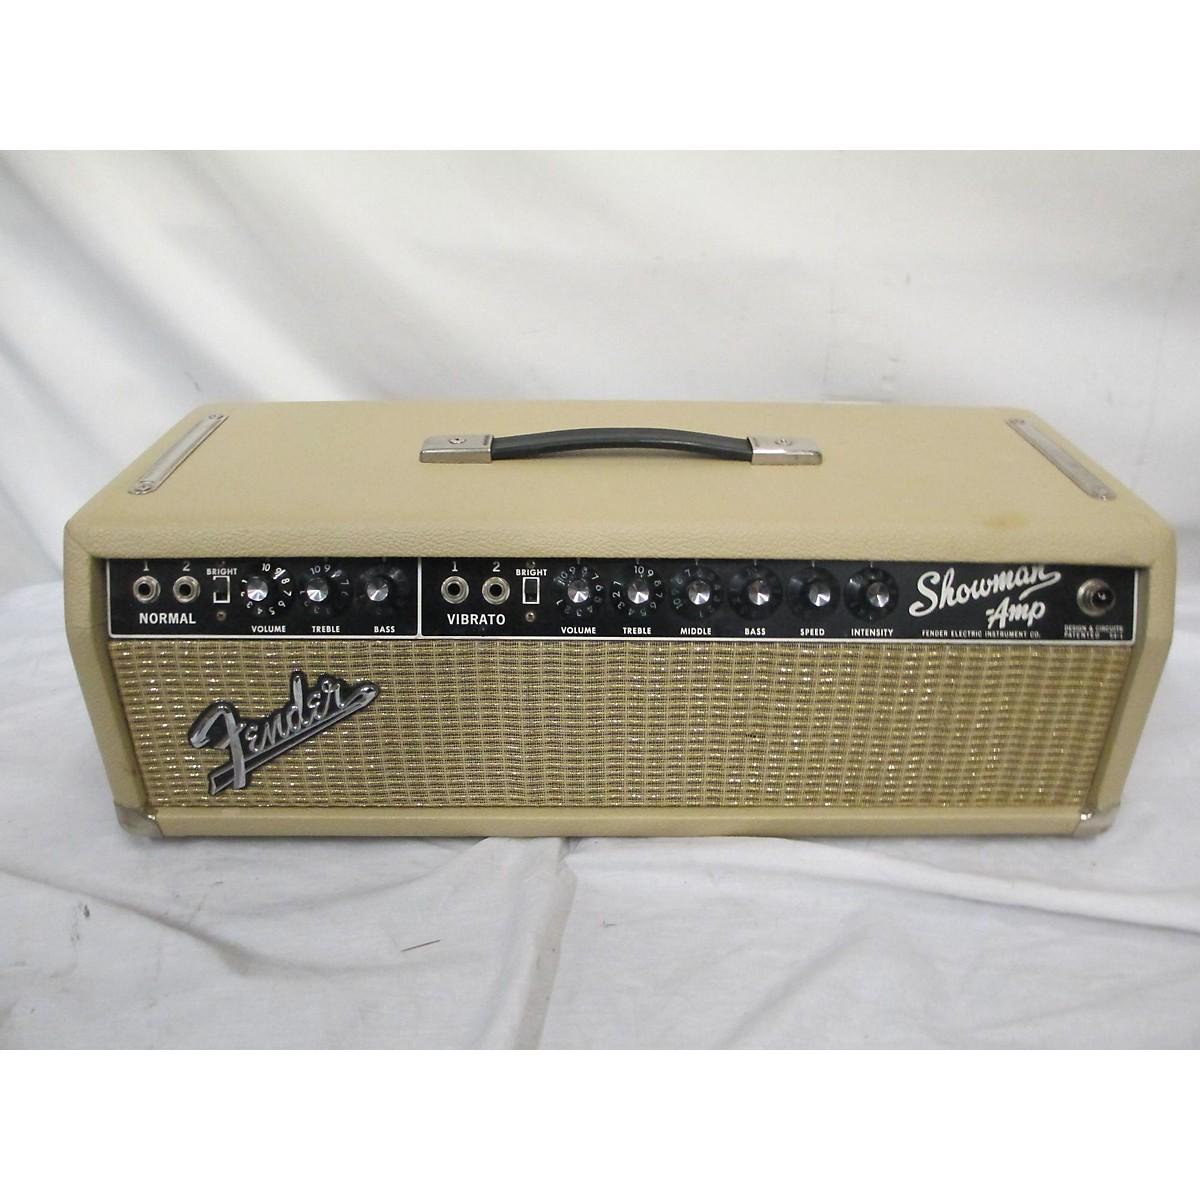 Fender 1964 Showman Amp Tube Guitar Amp Head